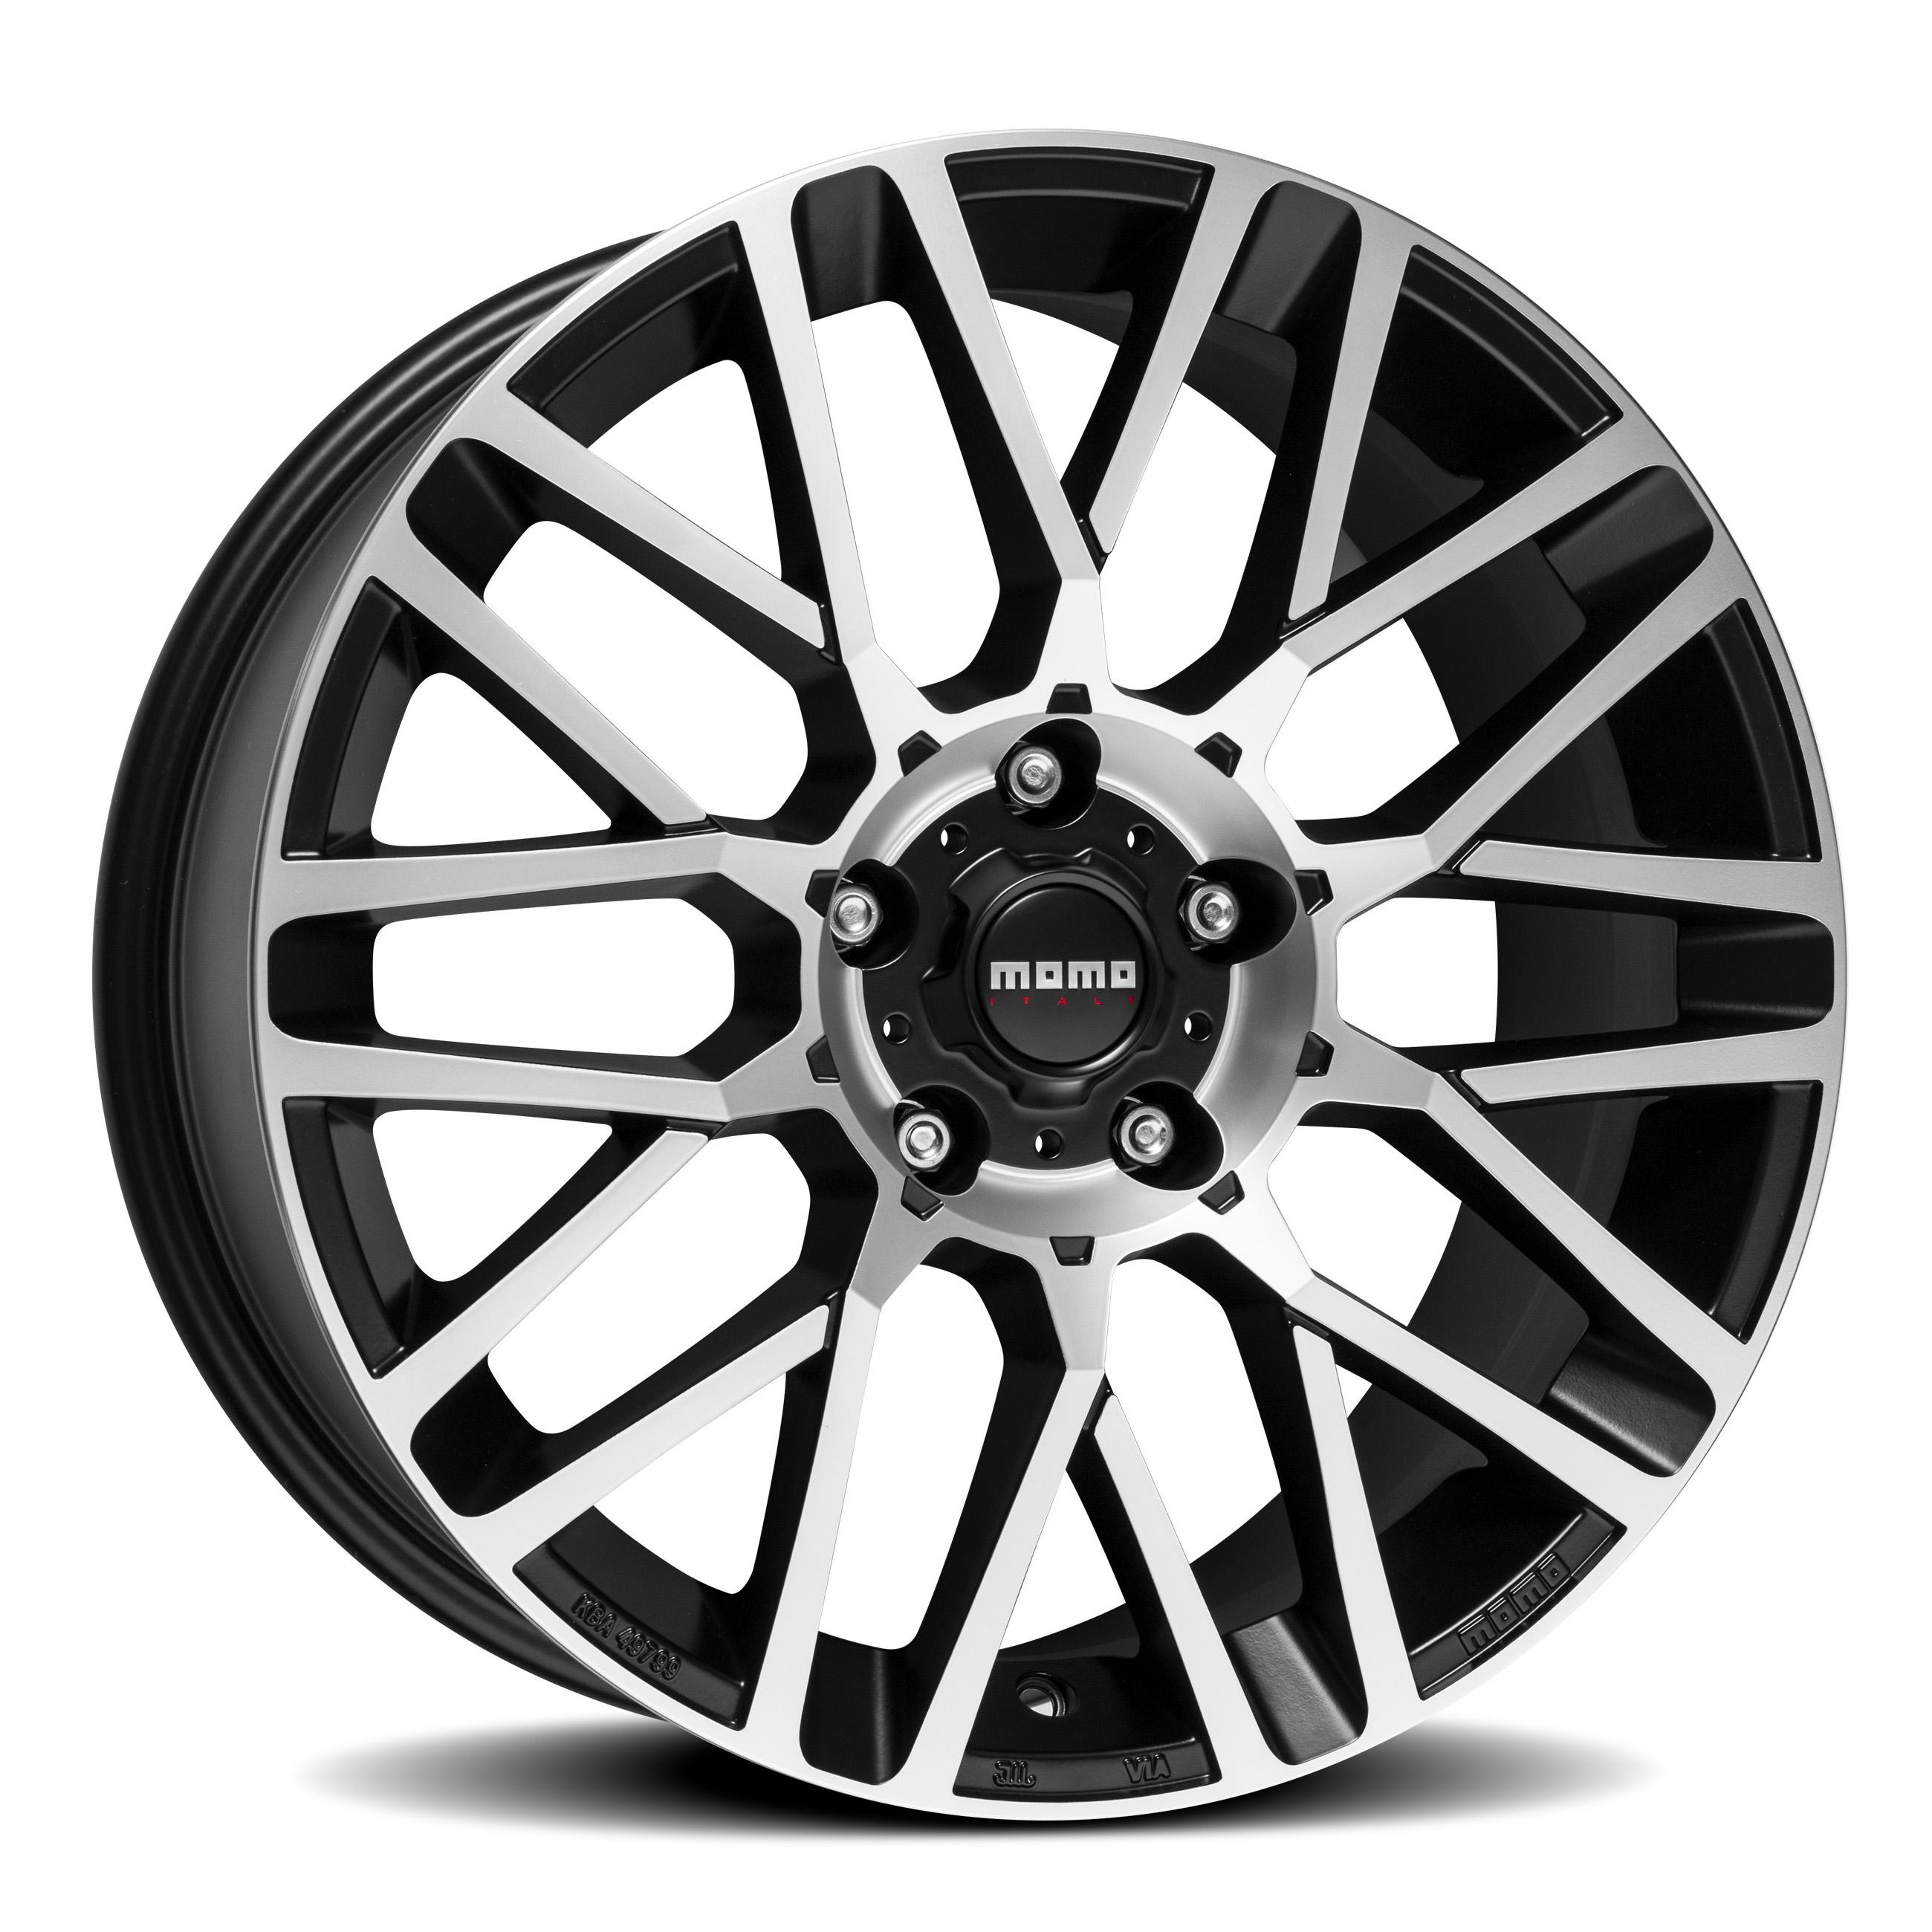 Jantes Alu Momo Revenge Evo 8 X 17 Et35 5x112 Pour Audi R8